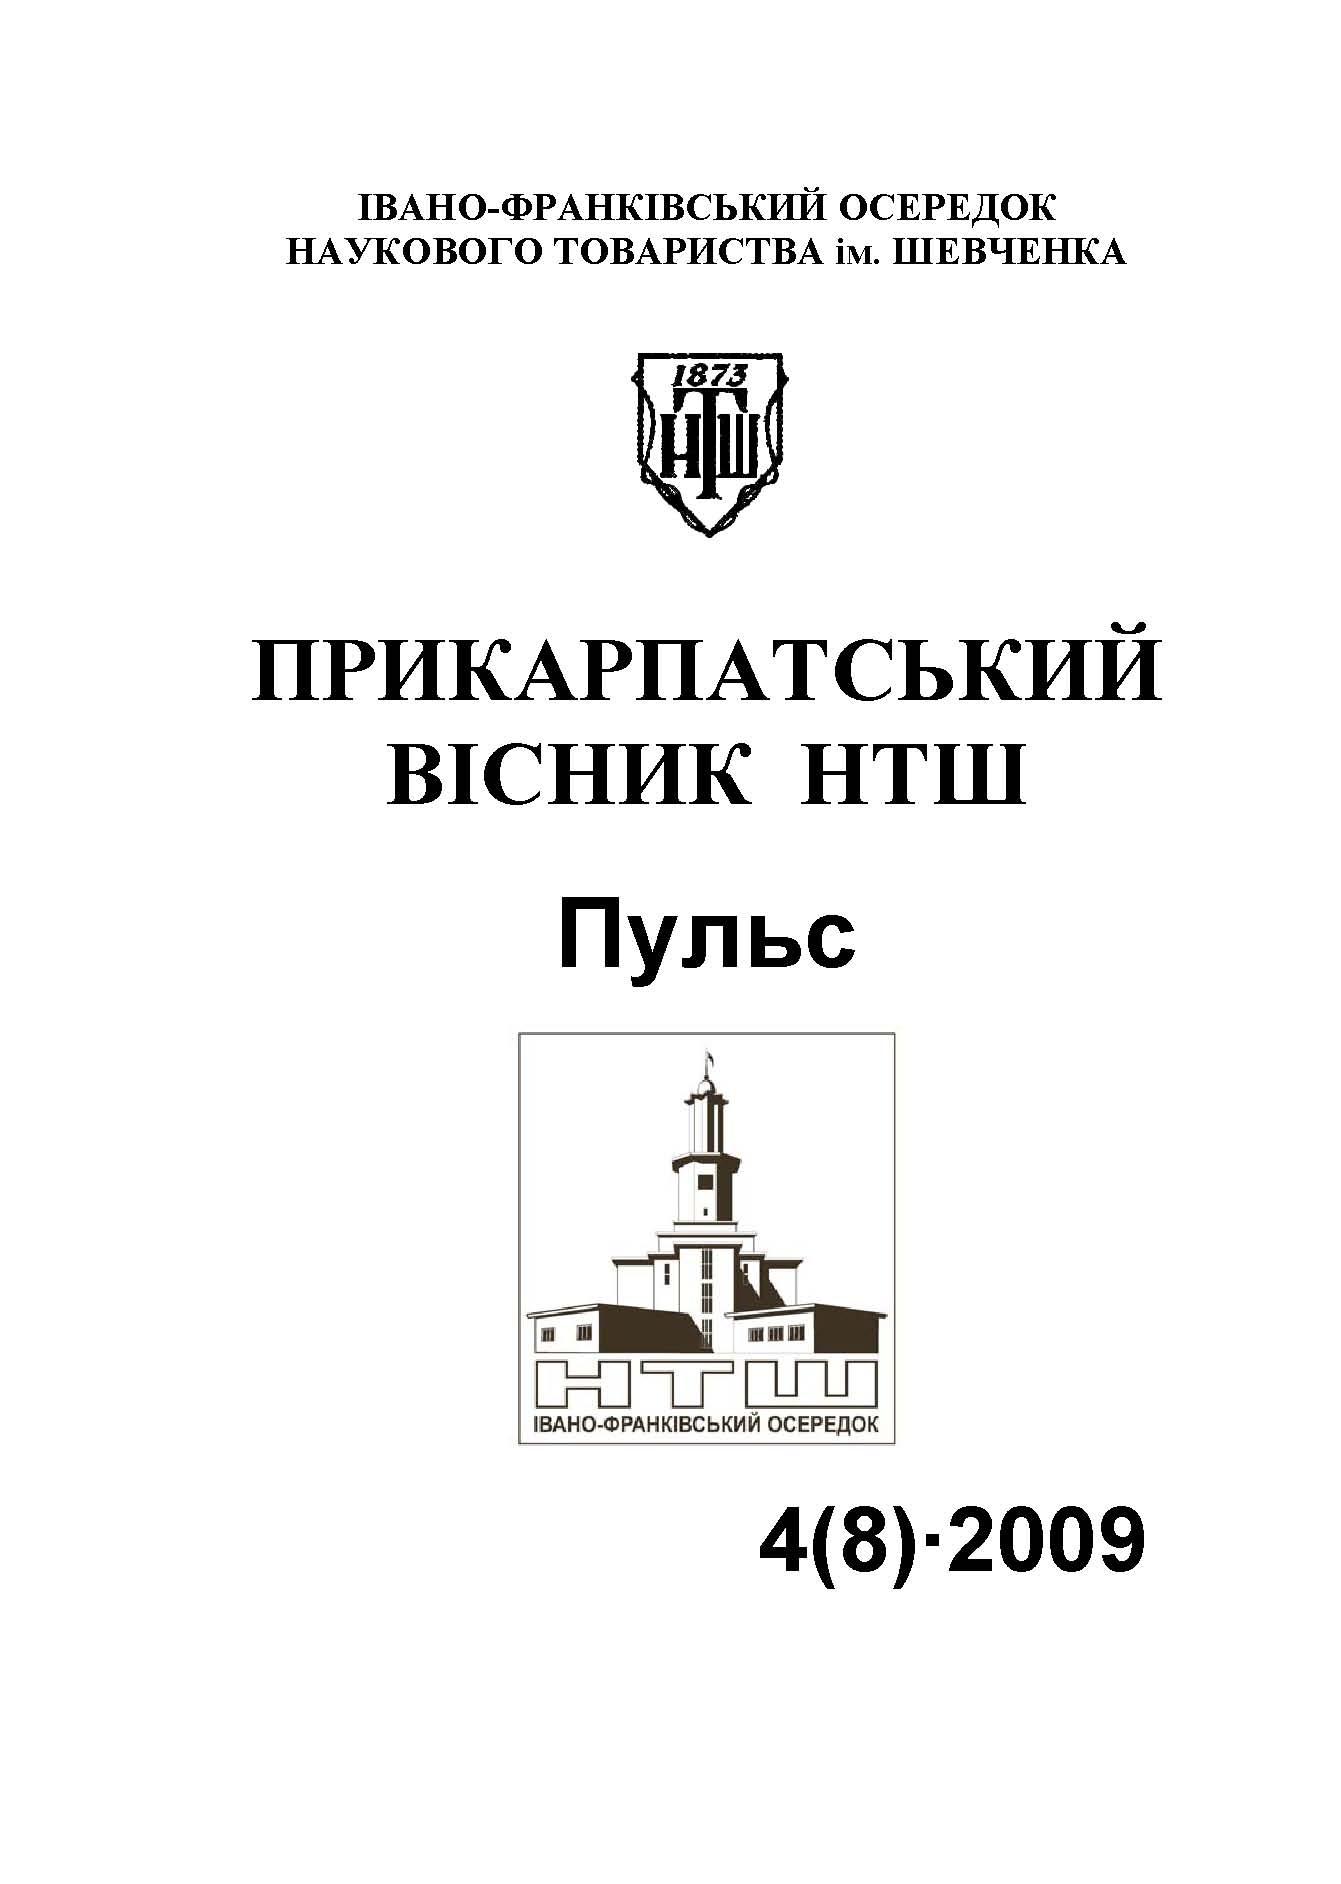 View No. 4(8) (2009): PRECARPATHIAN BULLETIN OF THE SHEVCHENKO SCIENTIFIC SOCIETY Pulse